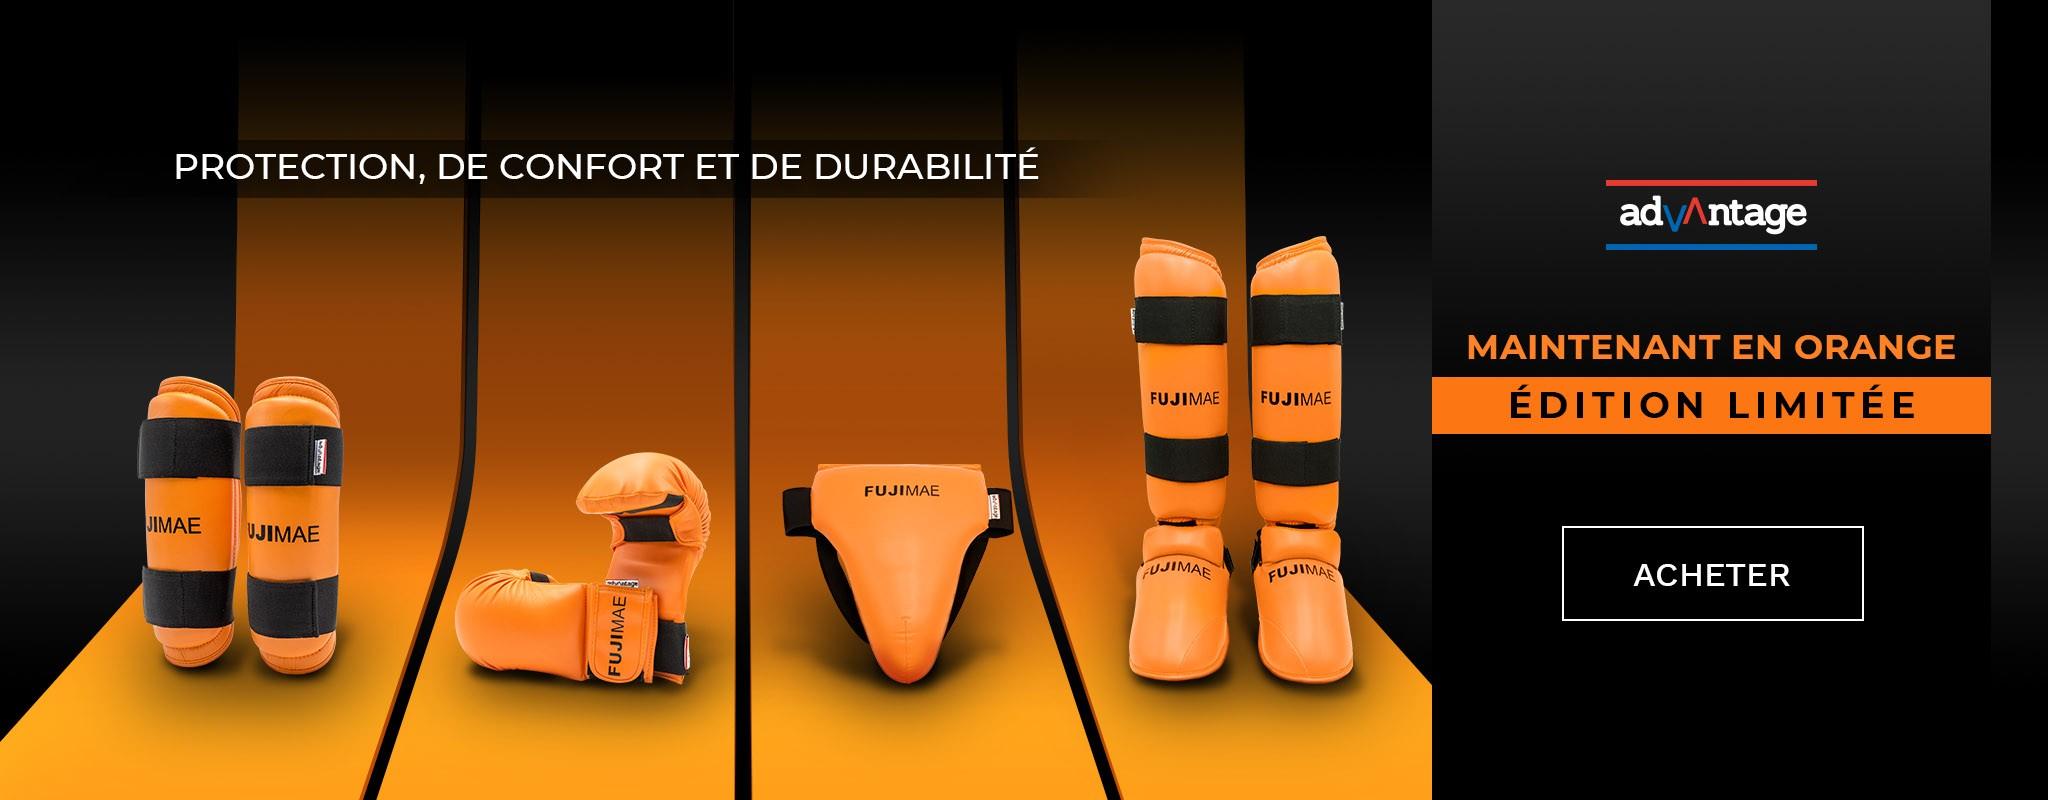 Protections Advantage Orange